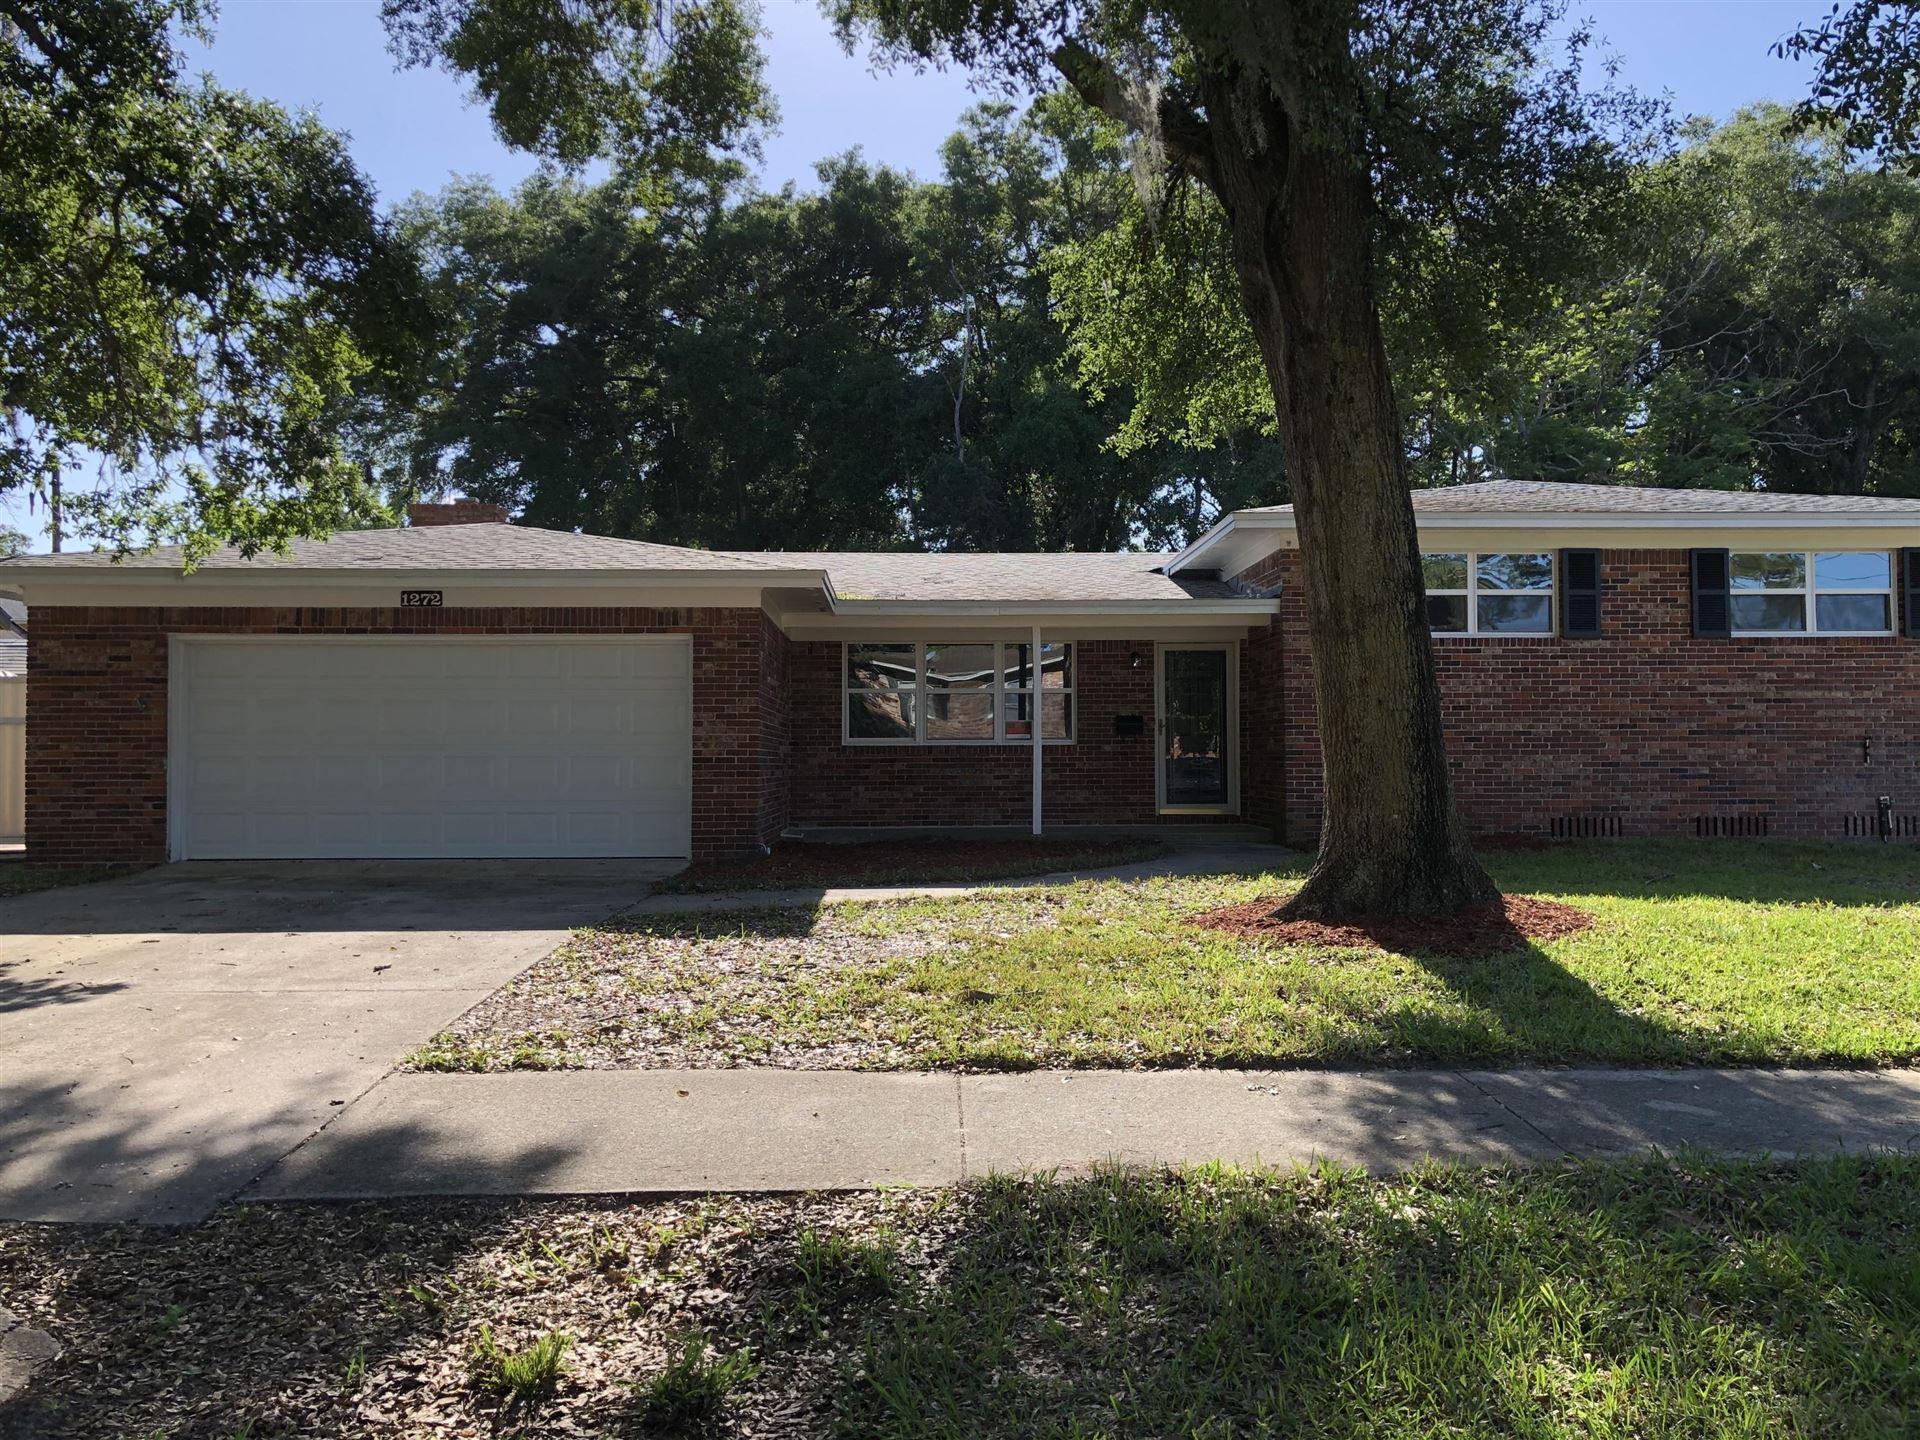 1272 ARLINGWOOD AVE, Jacksonville, FL 32211 - MLS#: 1107369